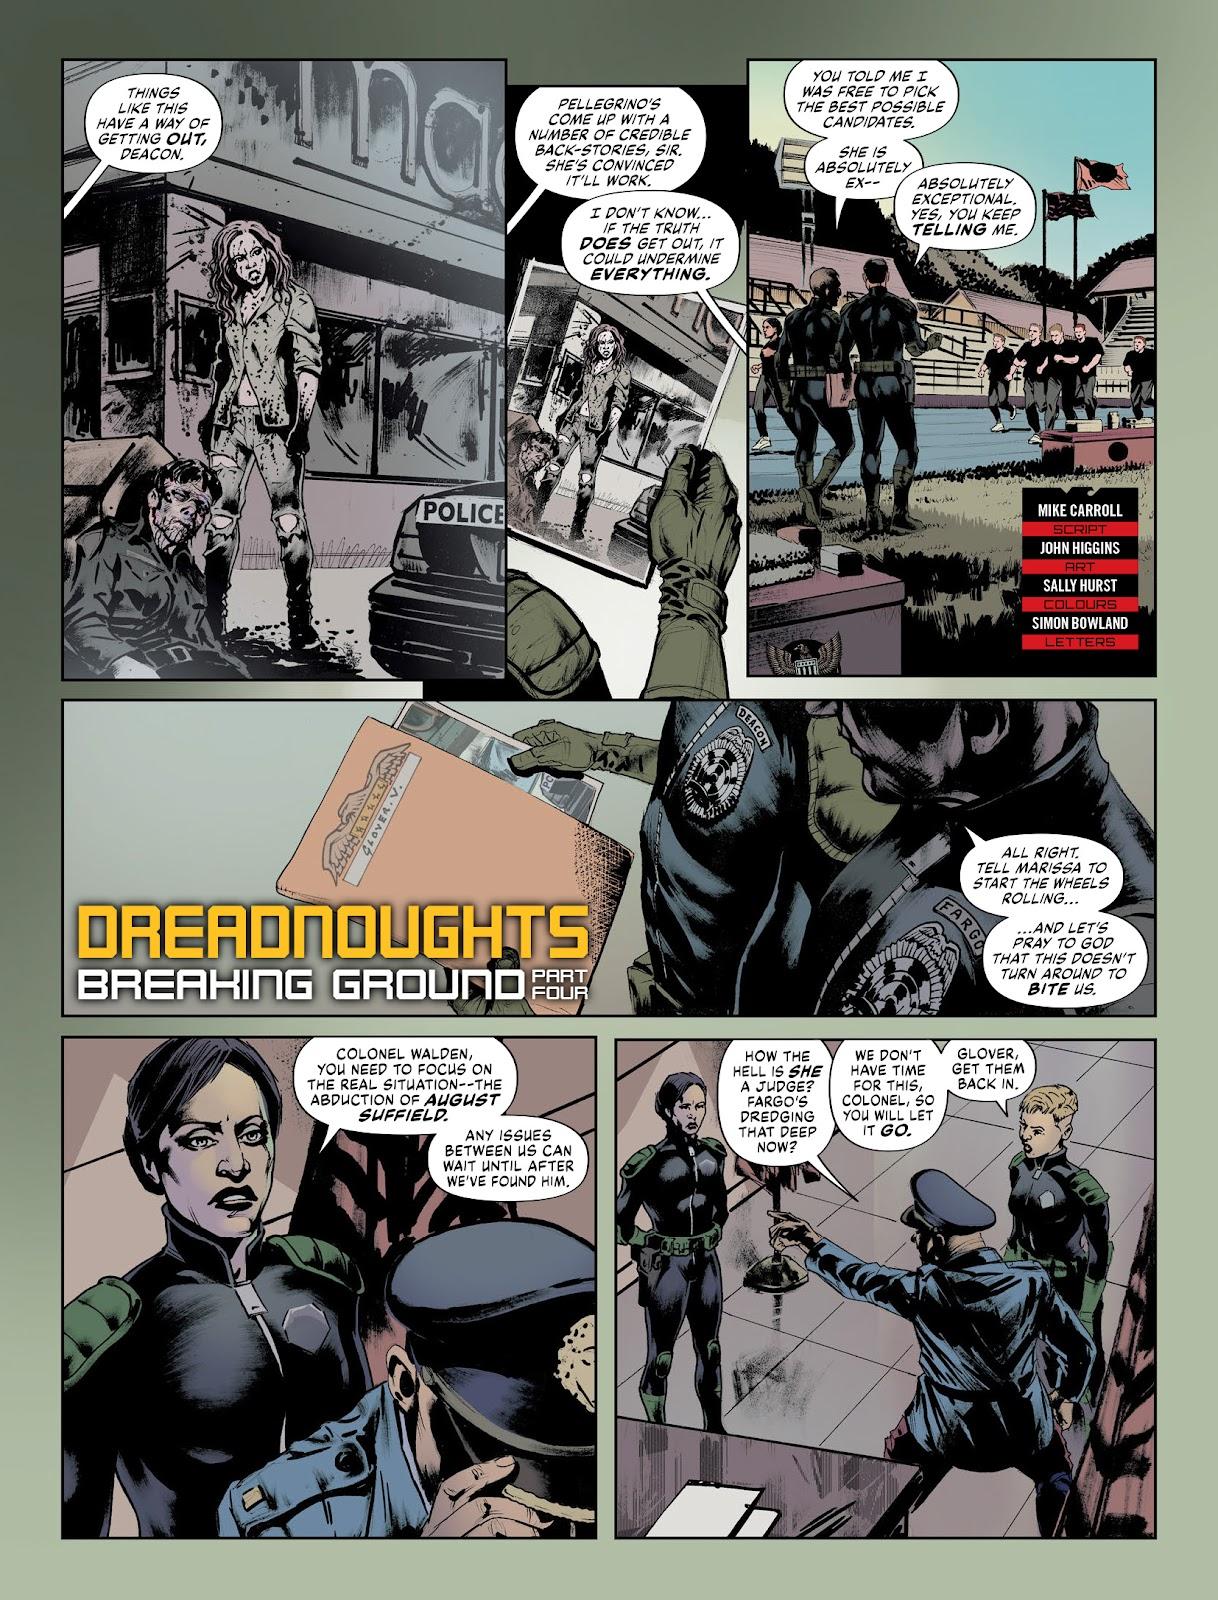 Judge Dredd Megazine (Vol. 5) issue 427 - Page 31